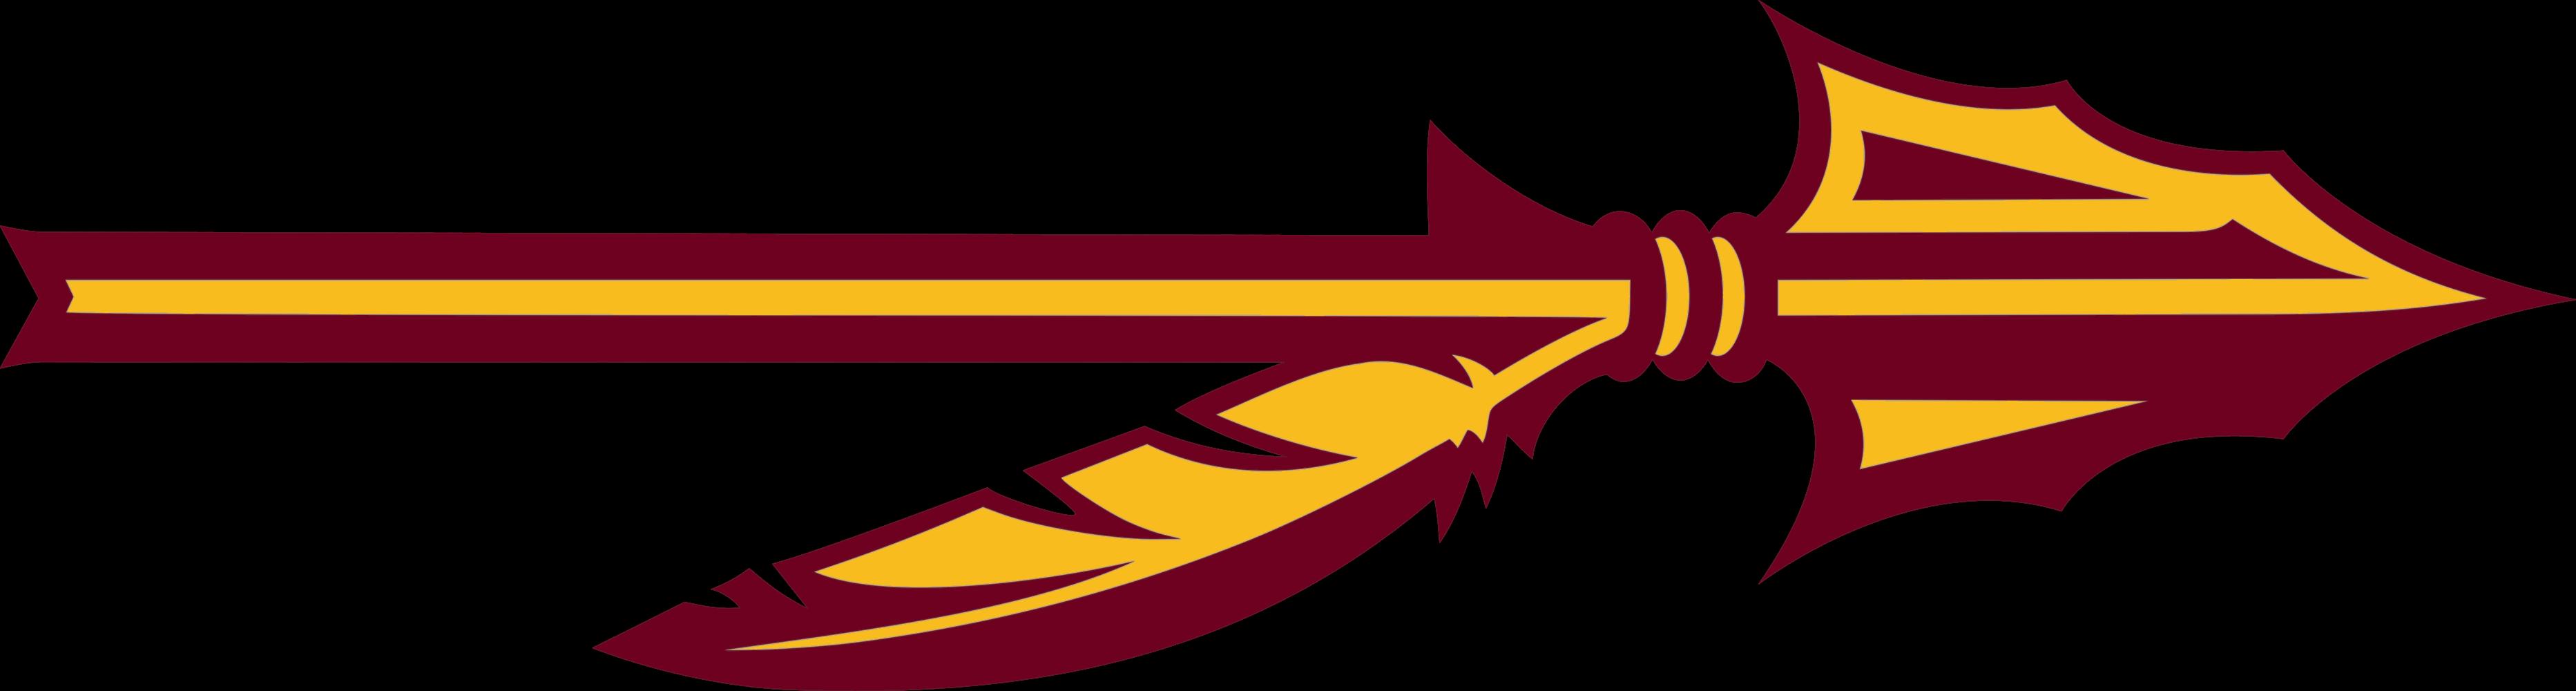 Helmet clipart fsu. Seminole s new logo